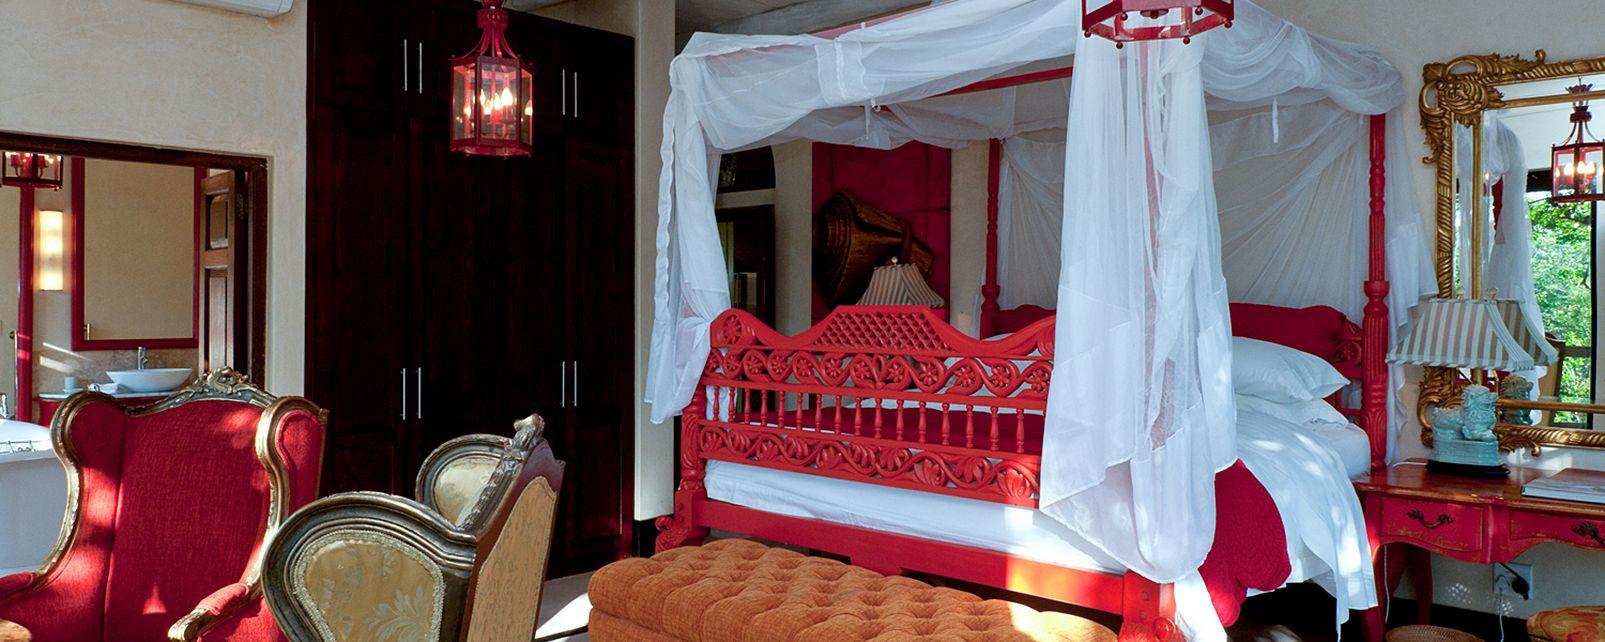 Hotel Royal Malewane Africa House